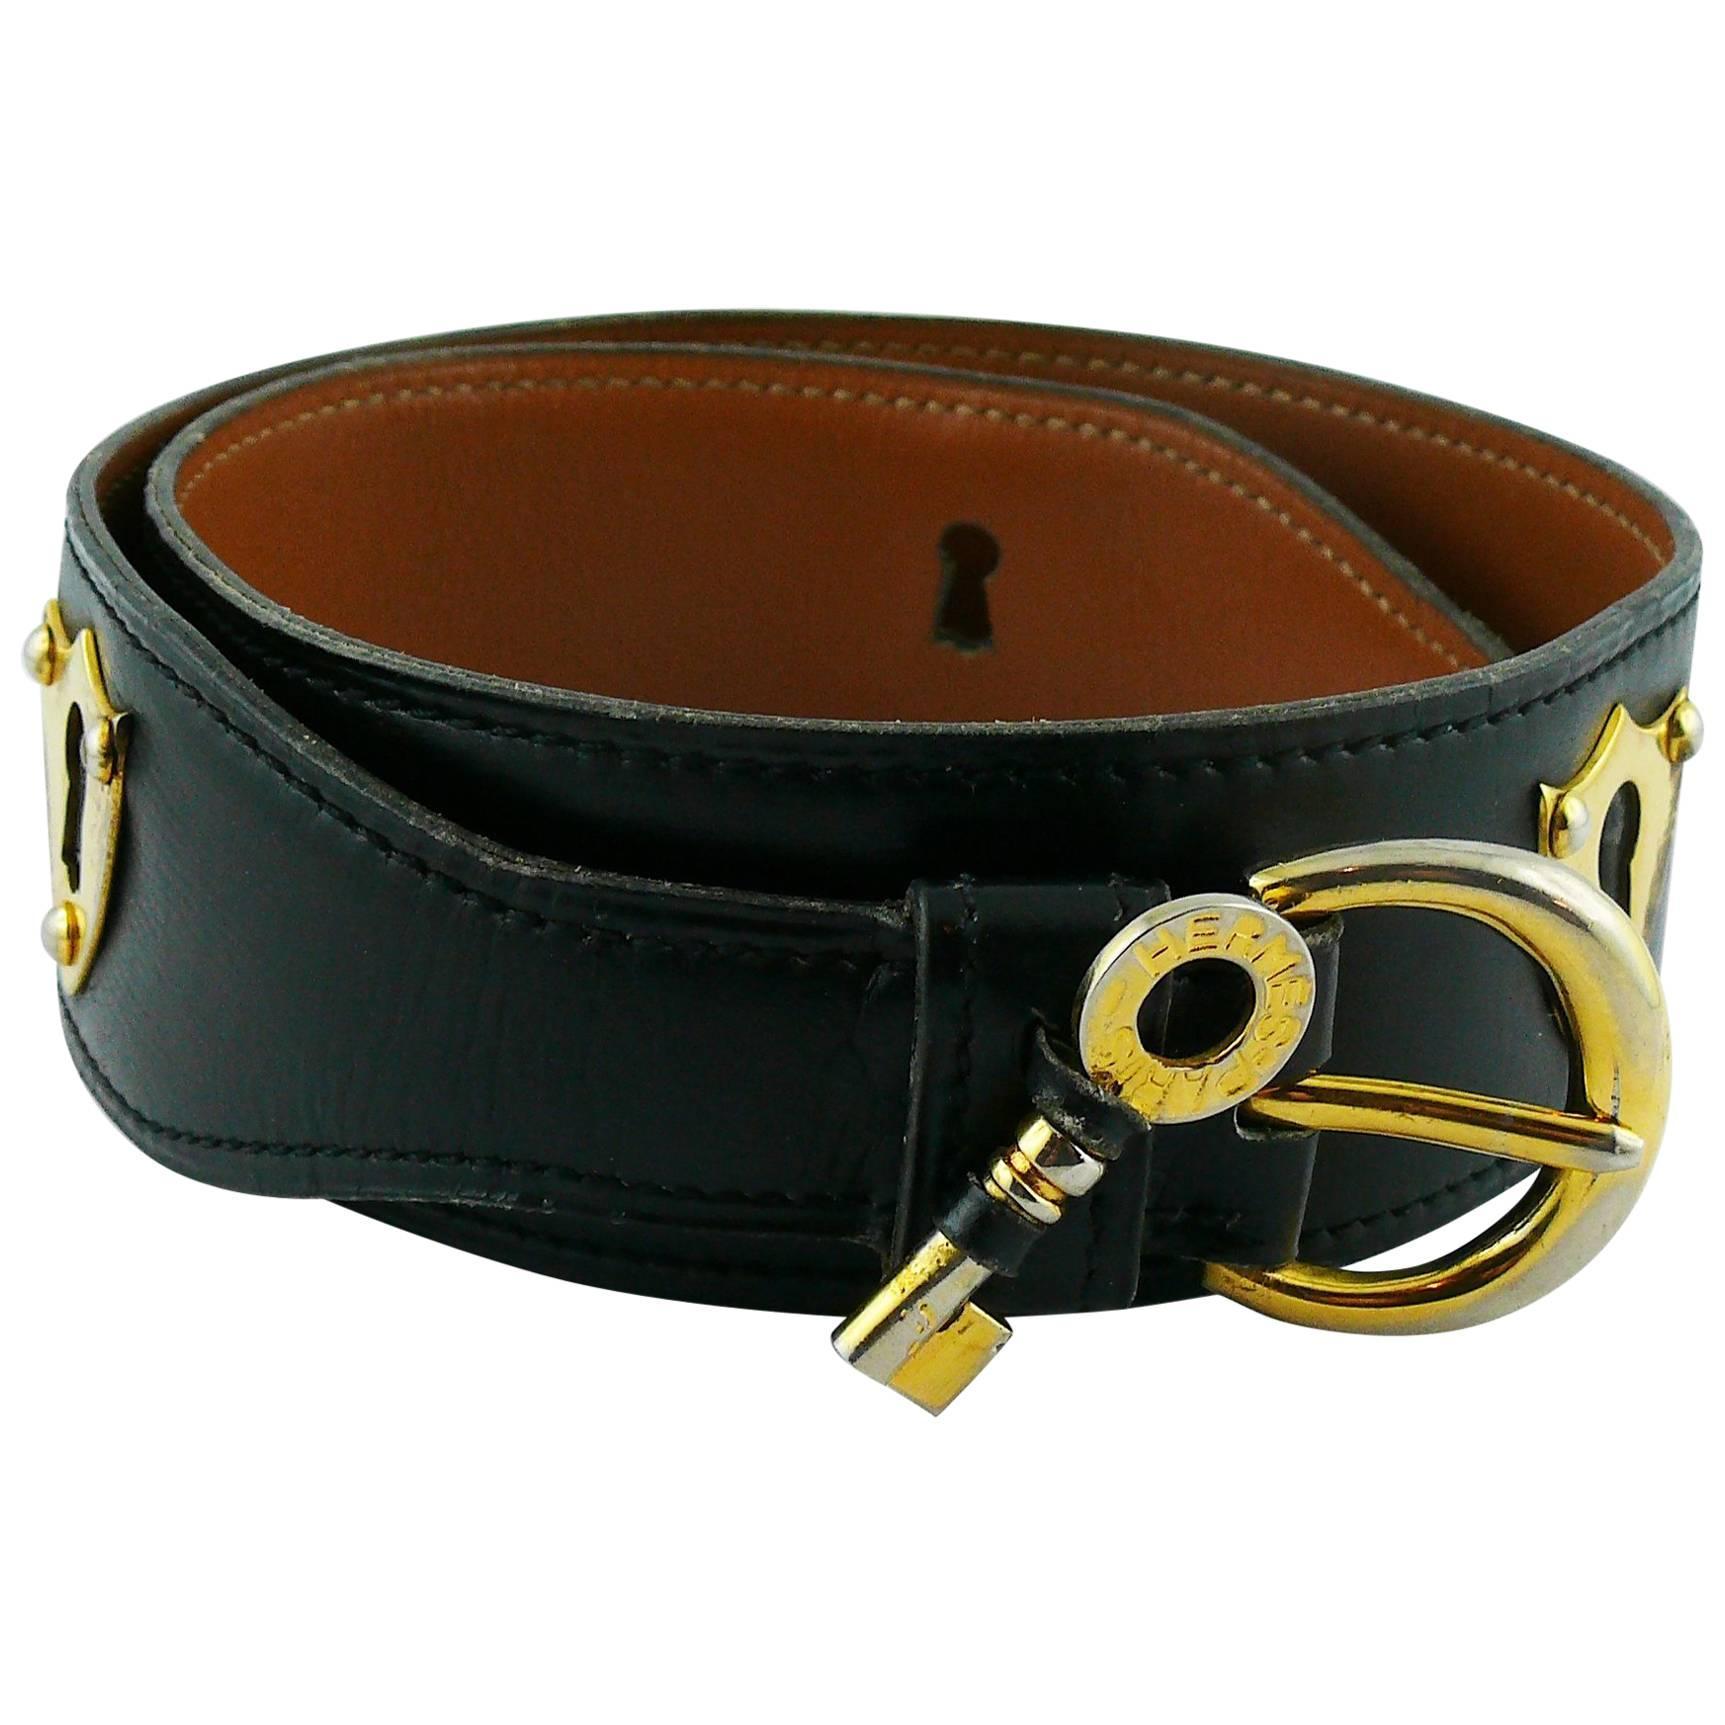 "Hermes Vintage ""Key Escutcheons"" Black Leather Belt, 1972"